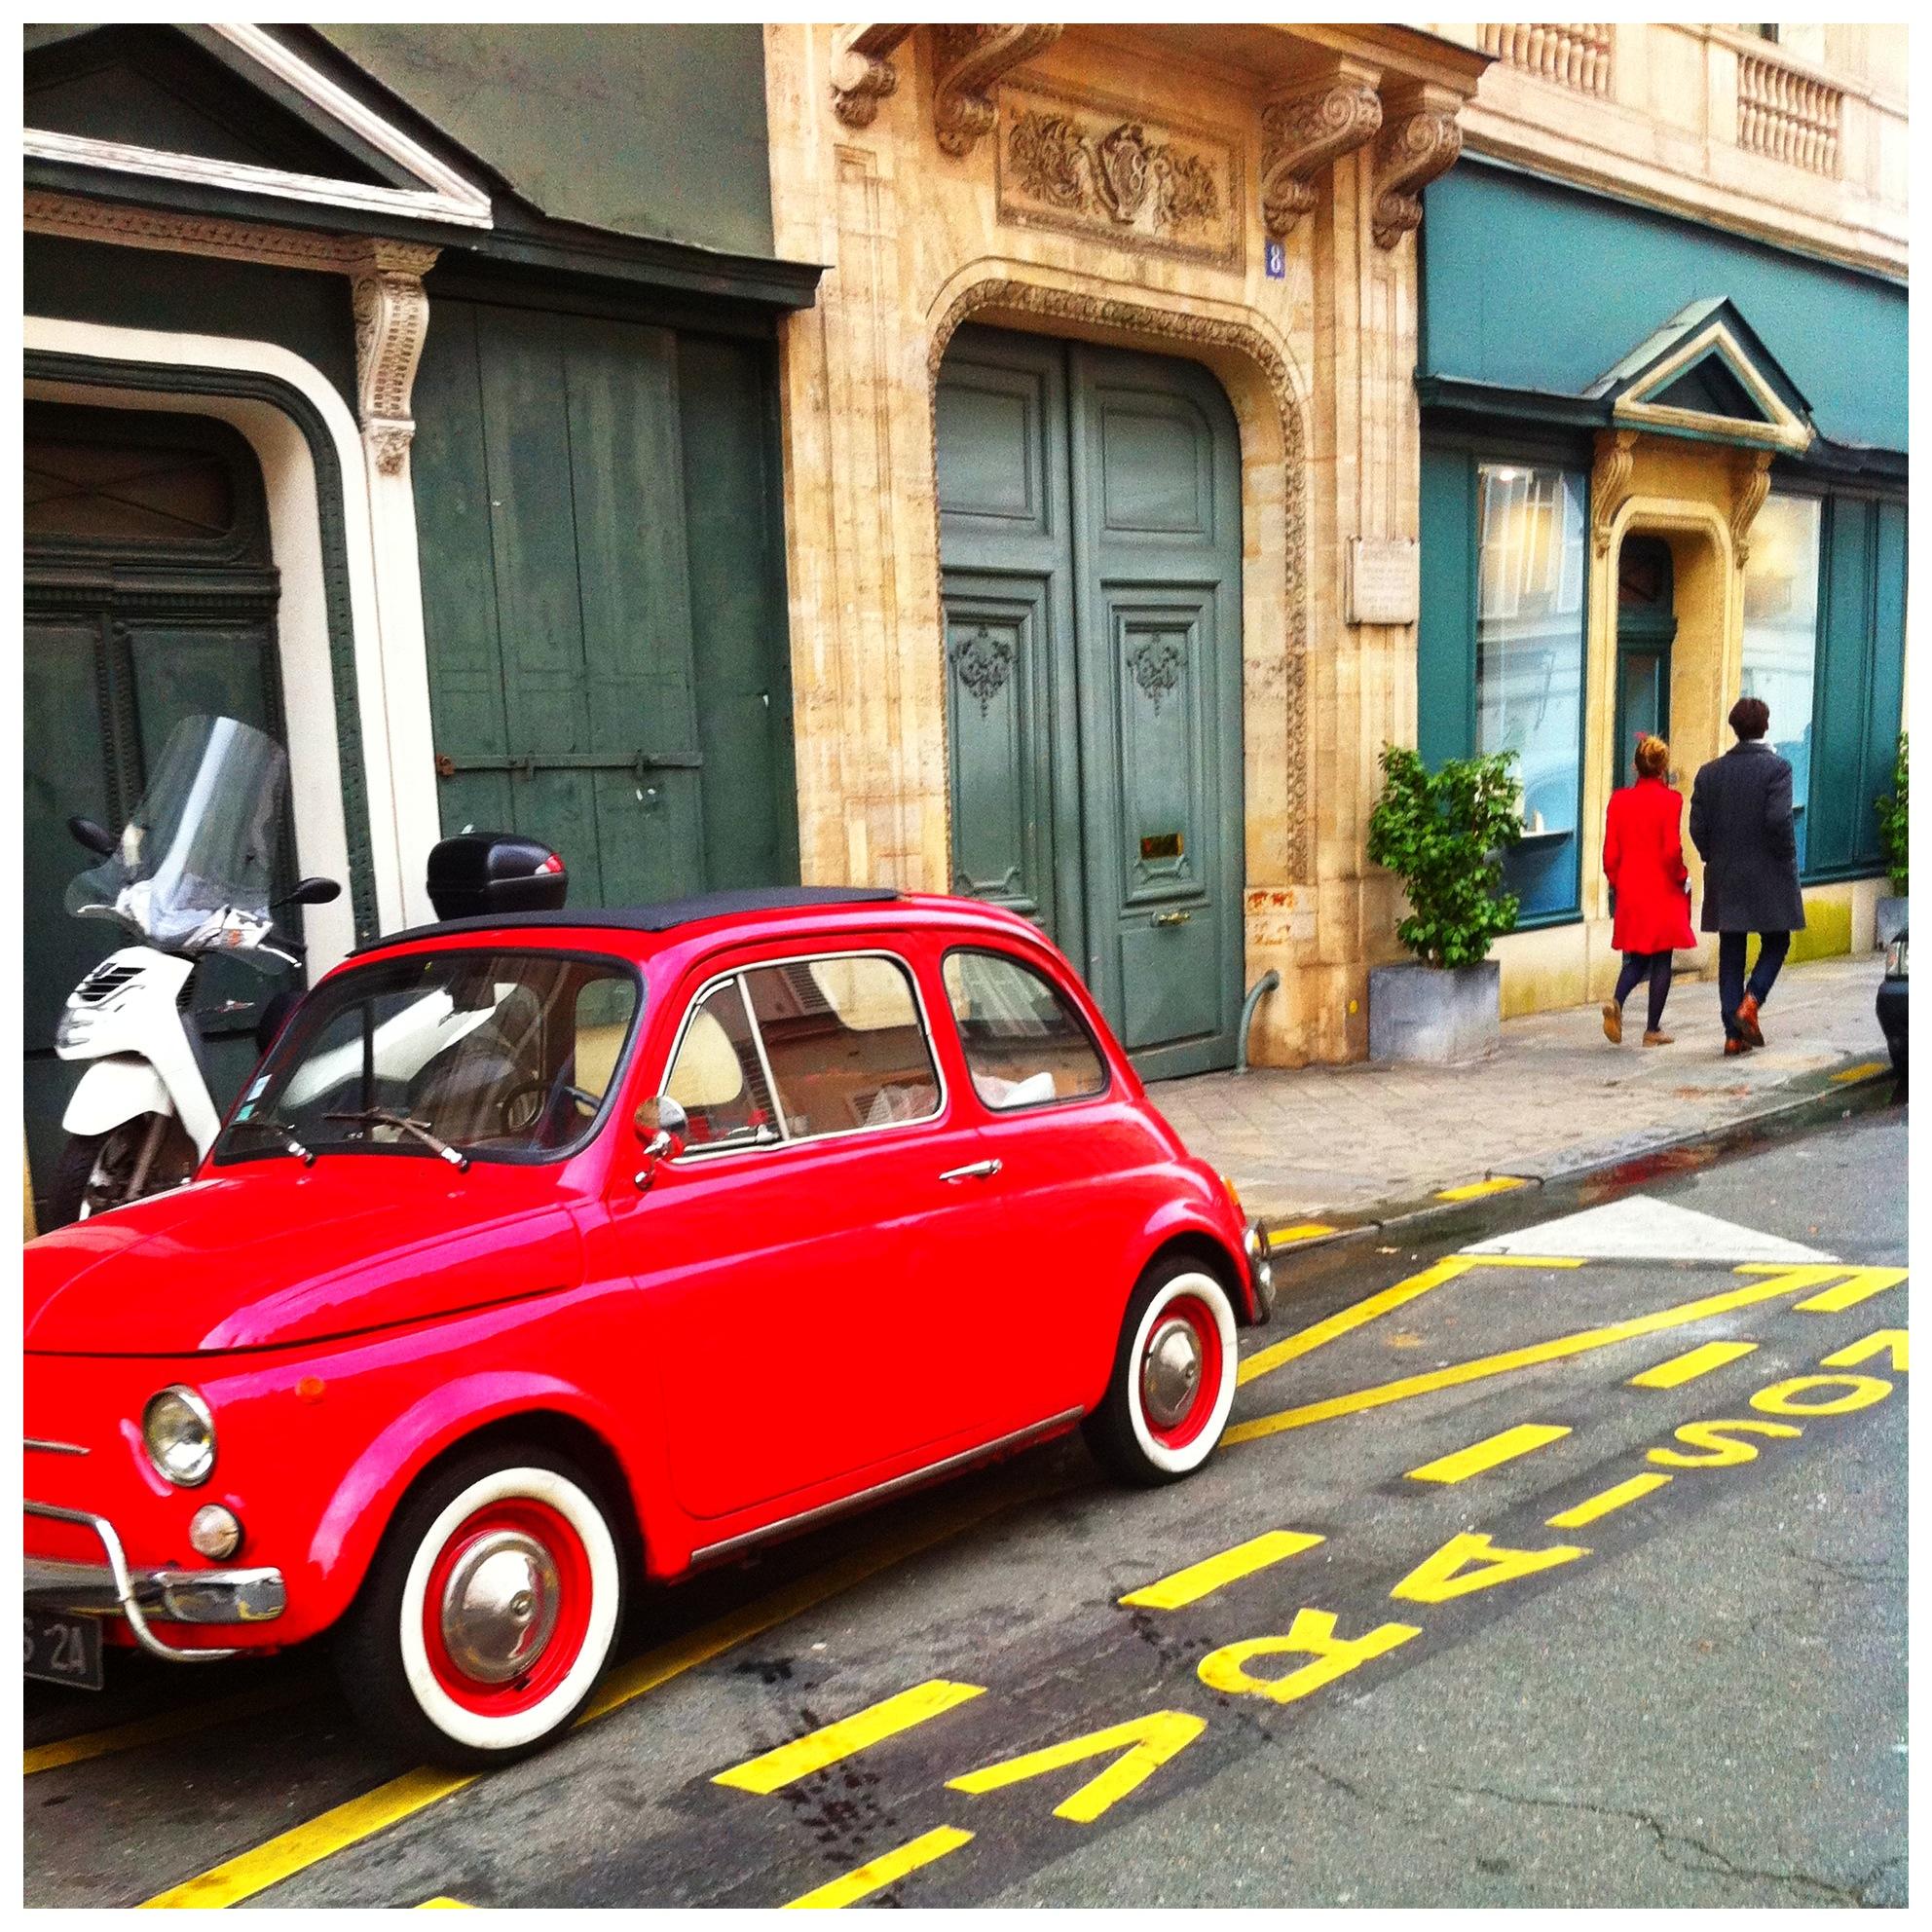 Red Car Blue Door Paris